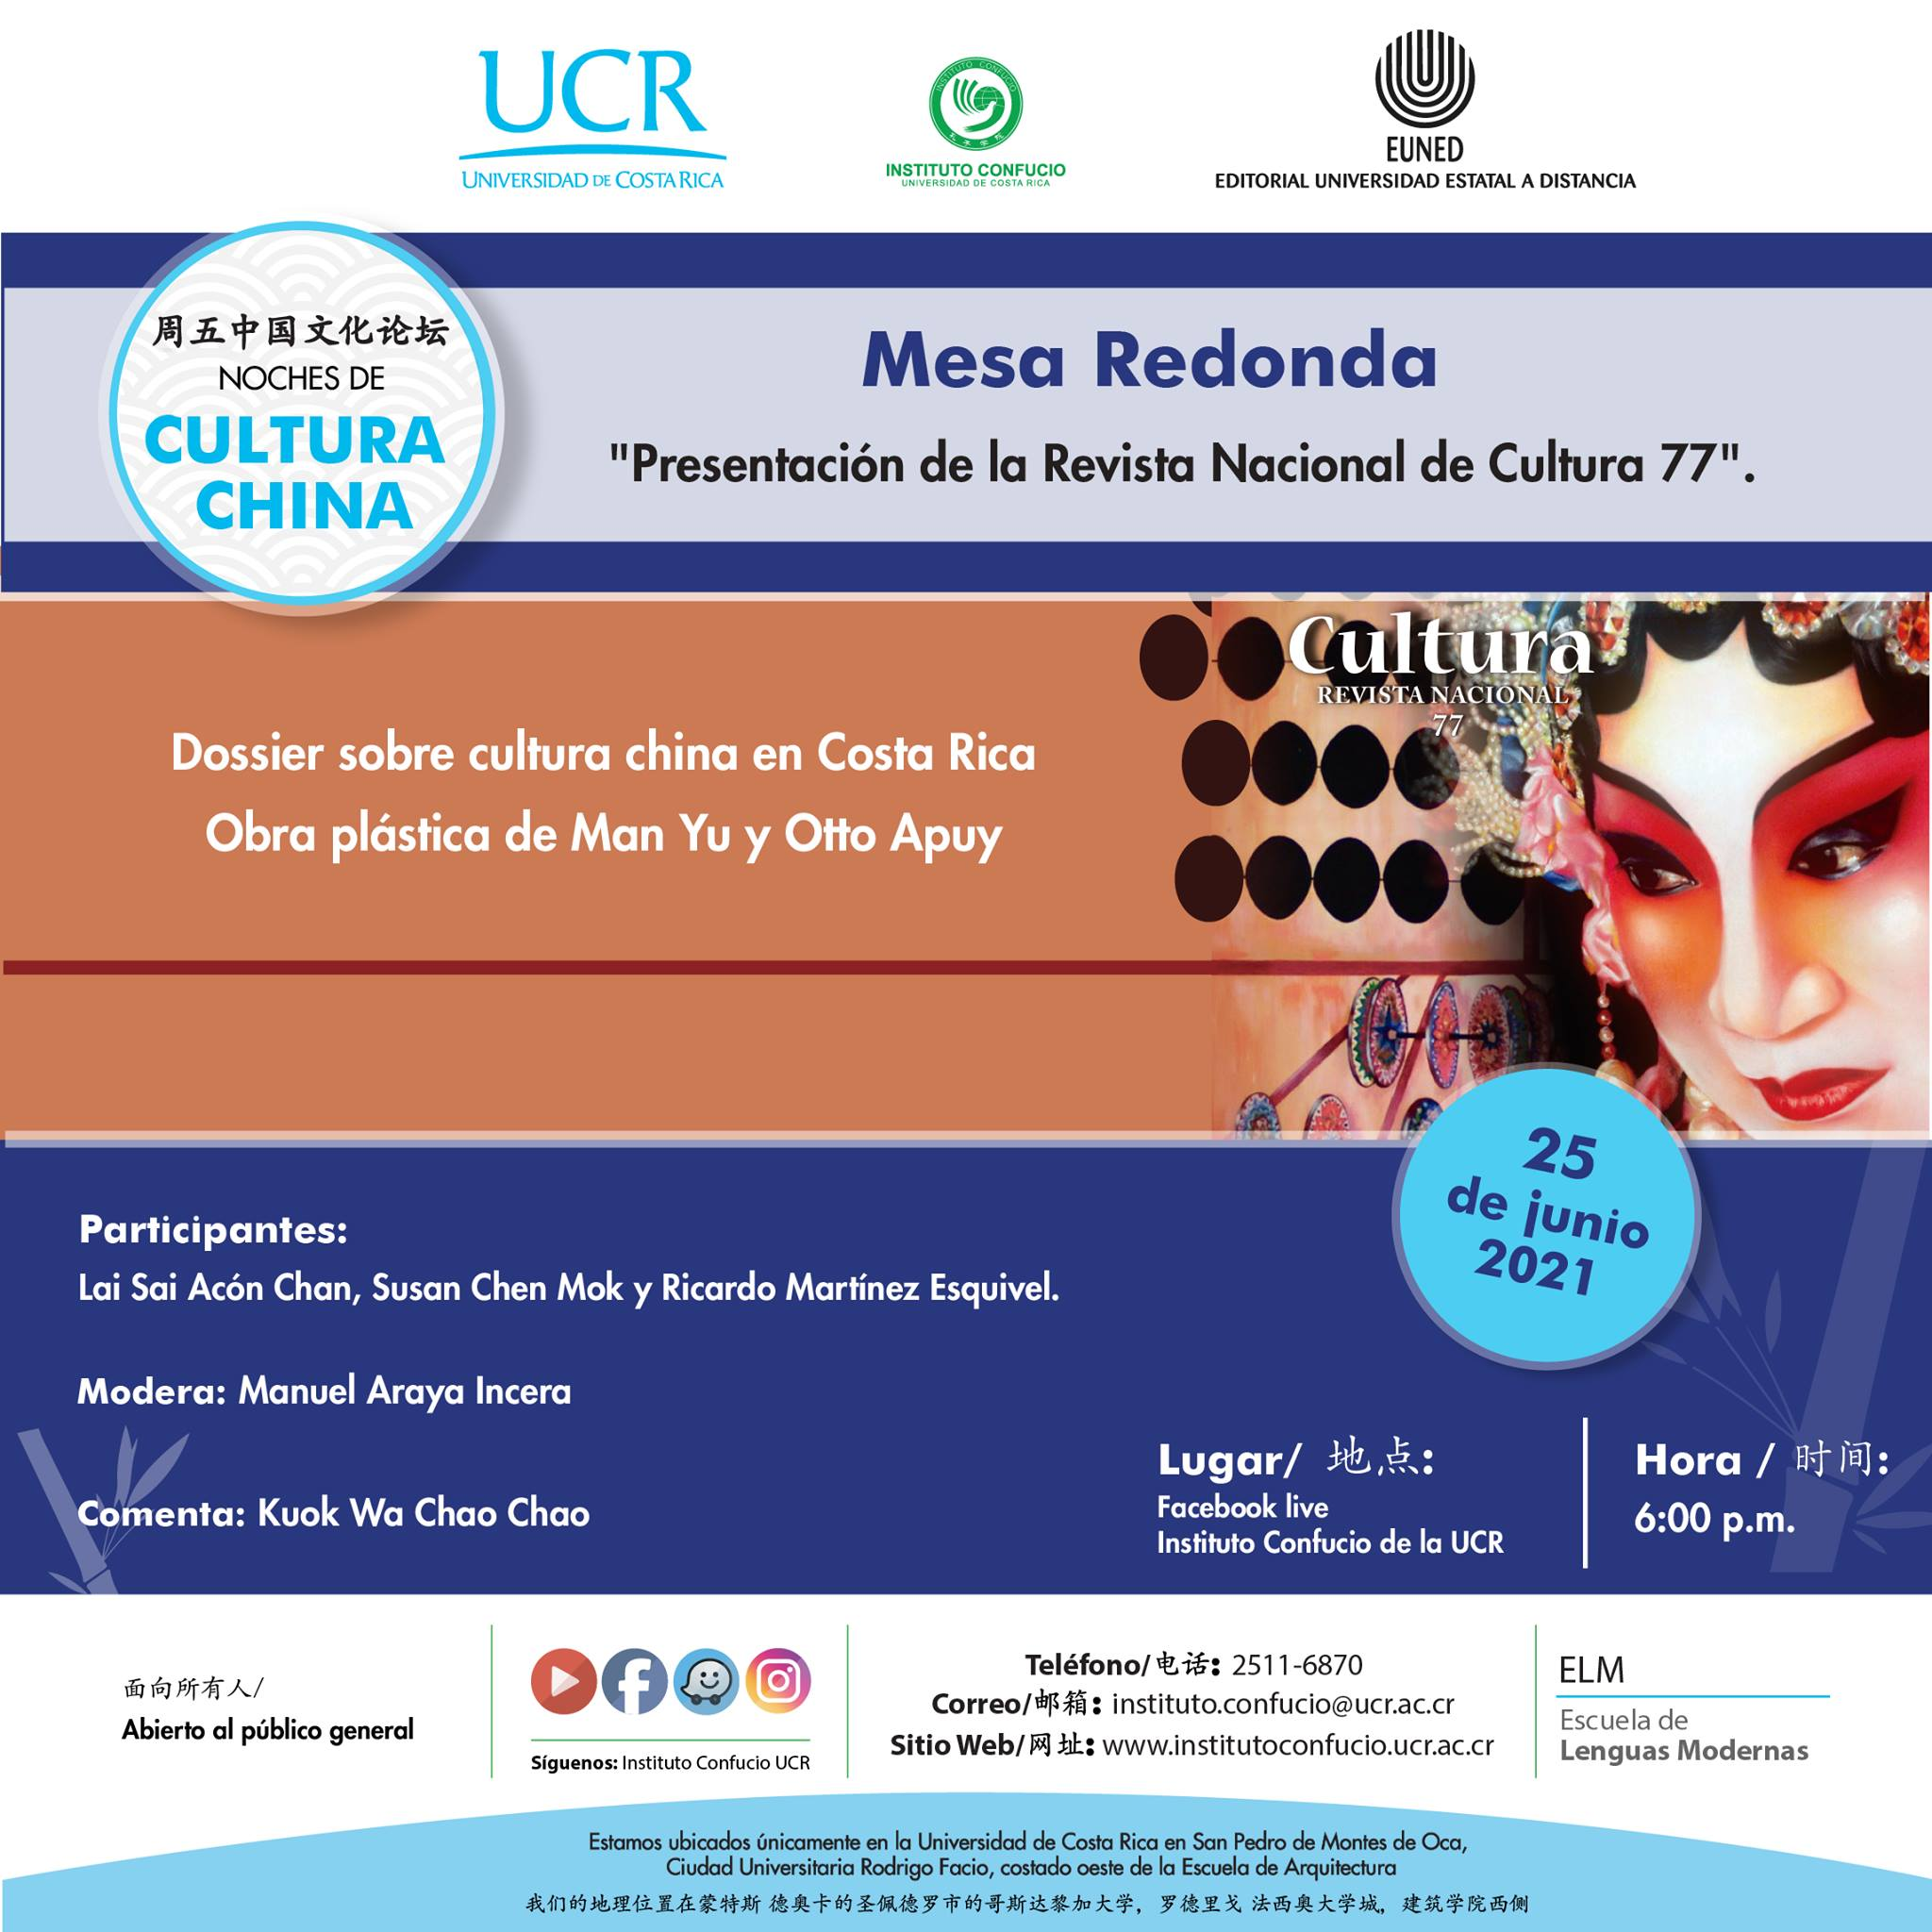 Presentación Revista Nacional de Cultura 77